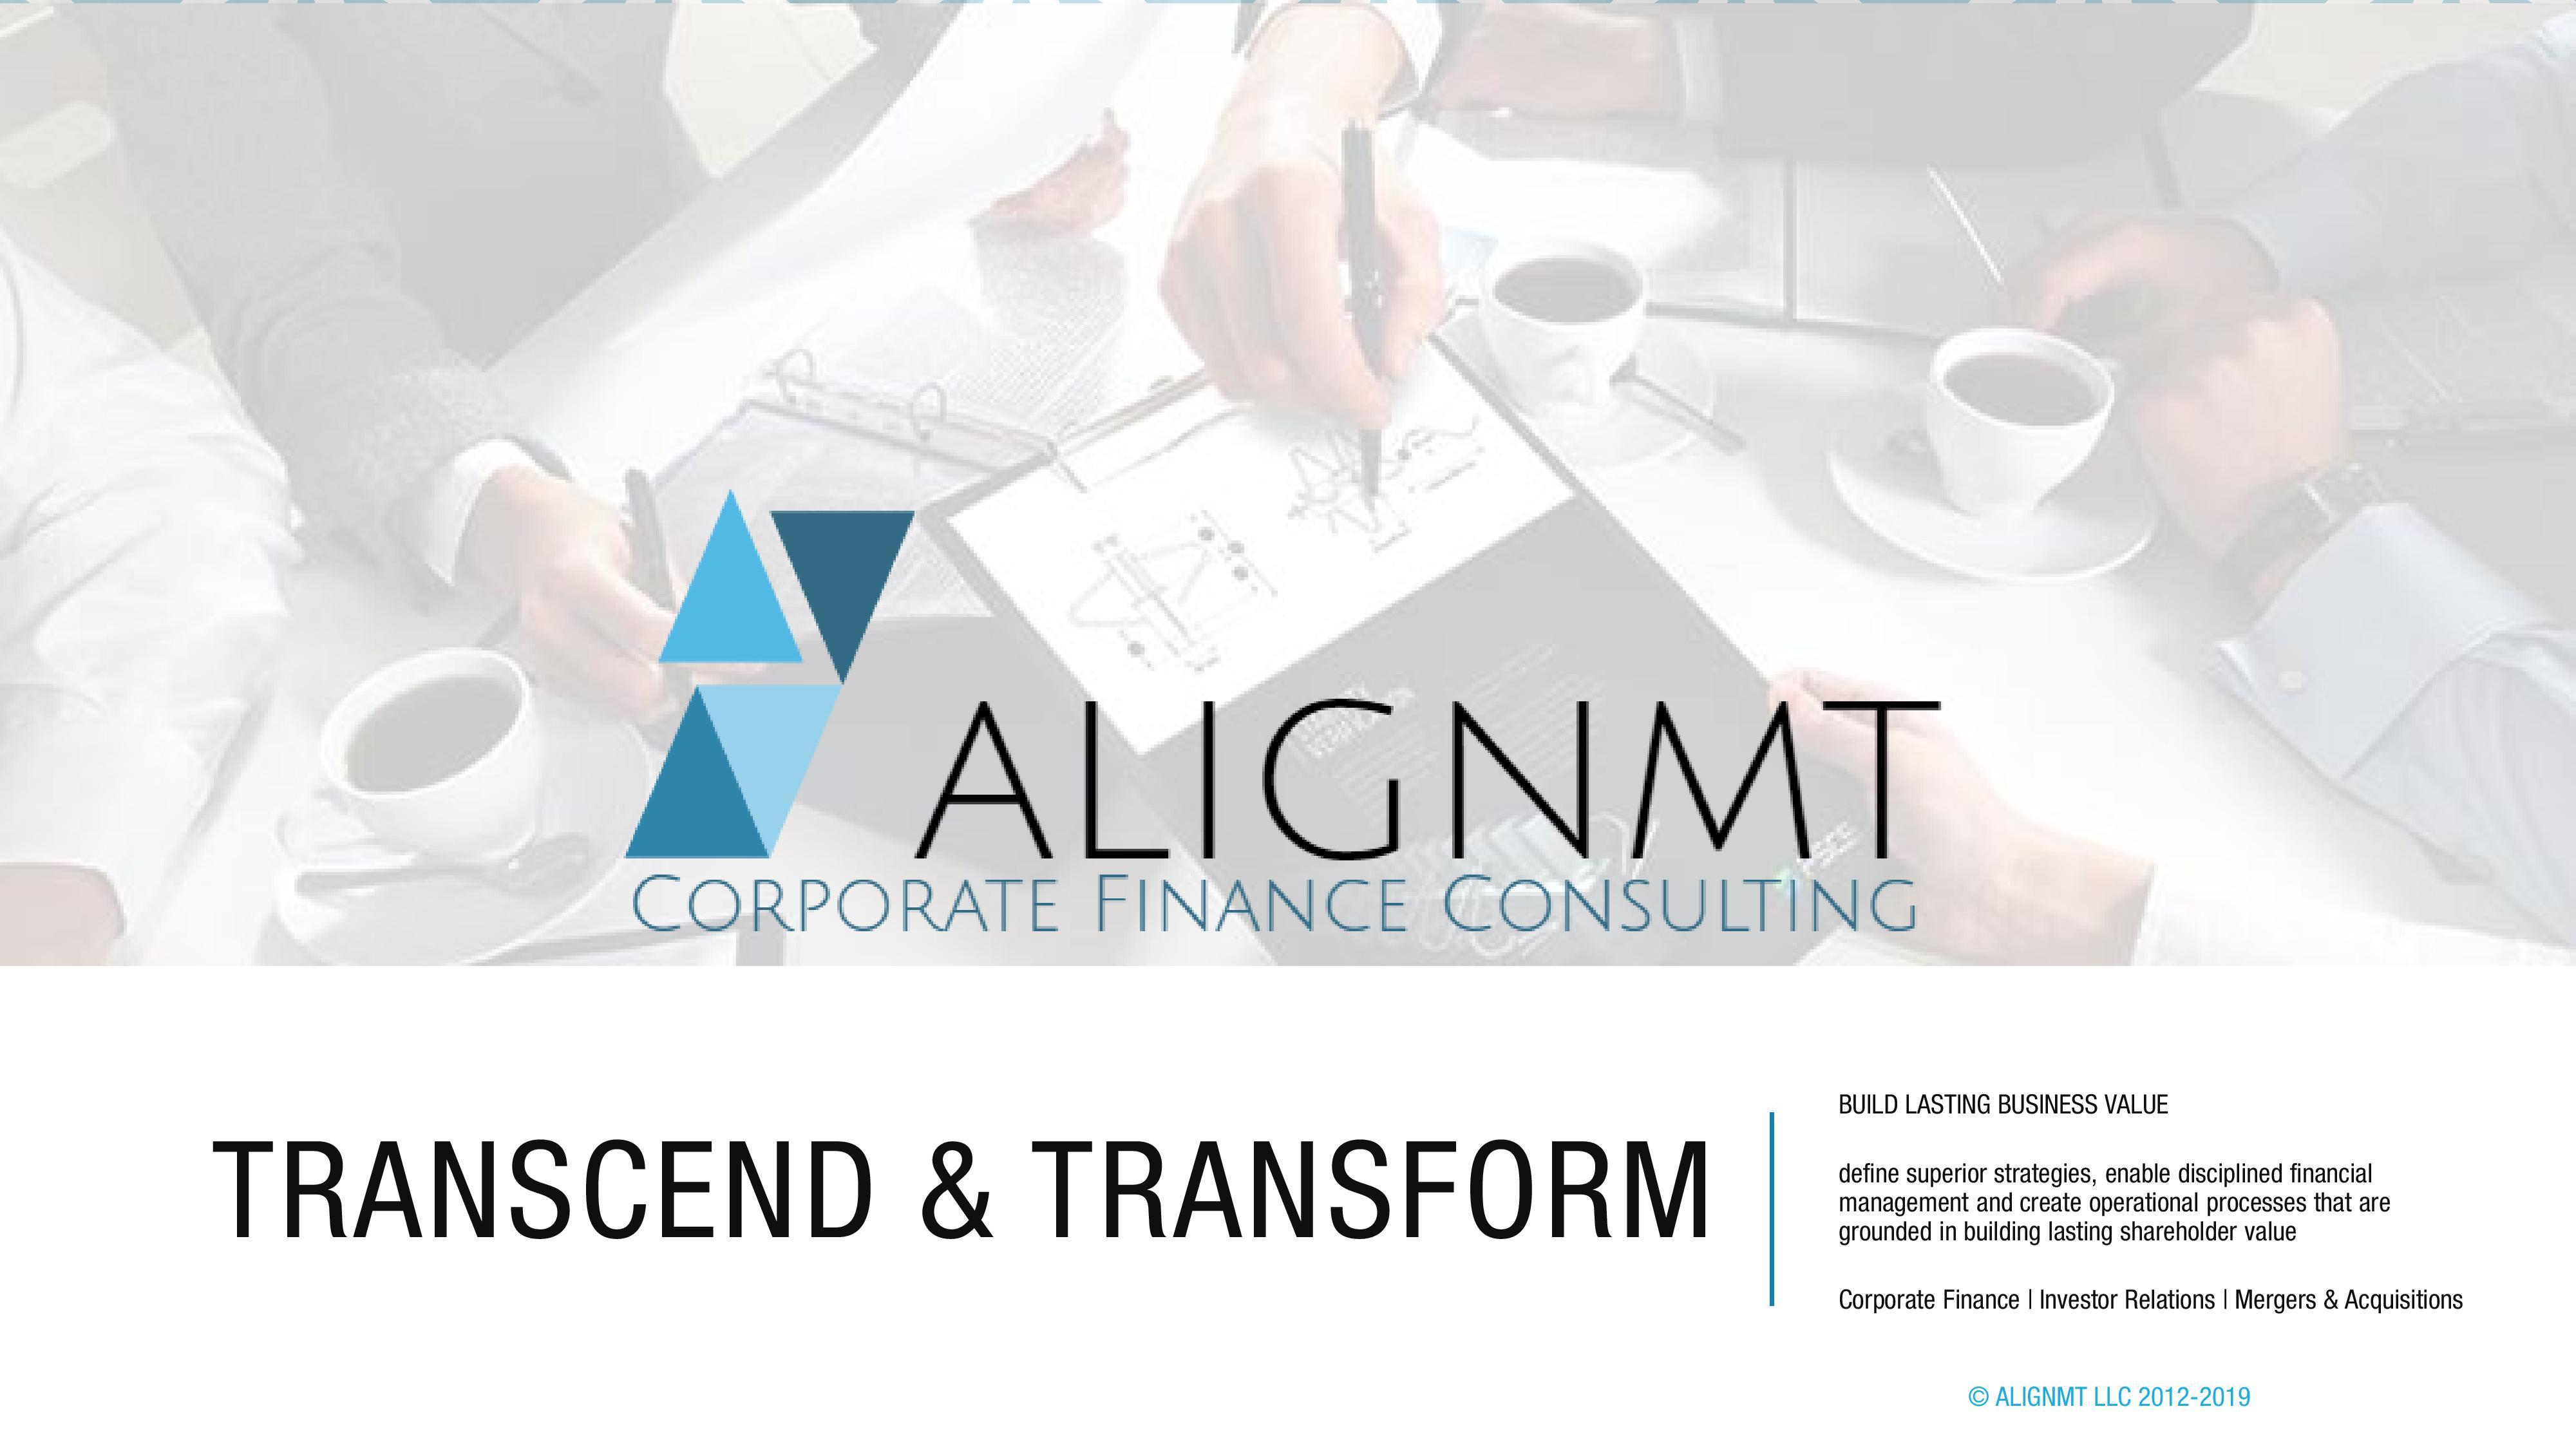 ALIGNMT Transcend & Transform